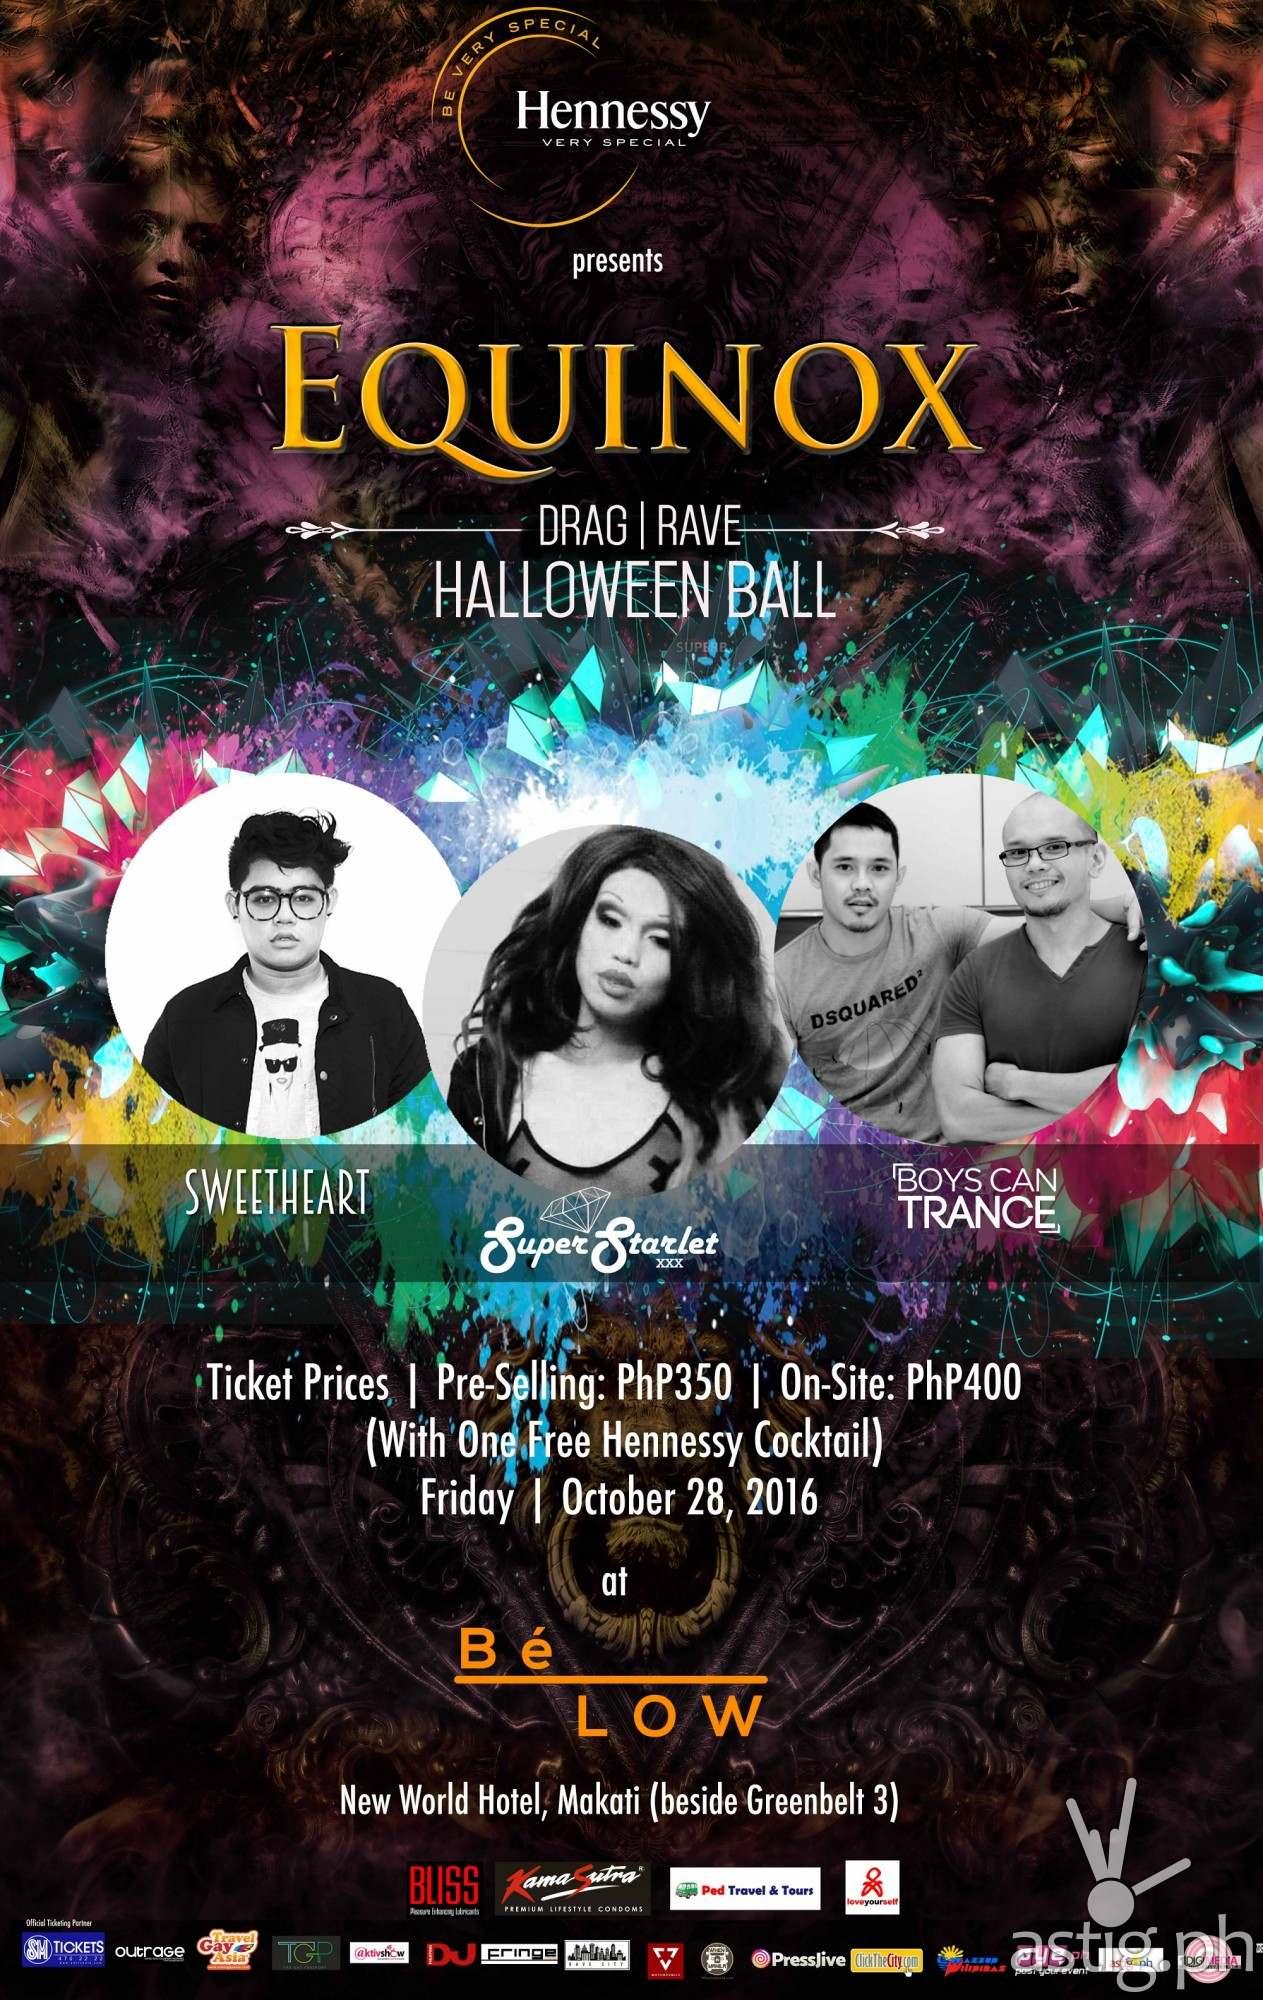 equinox poster